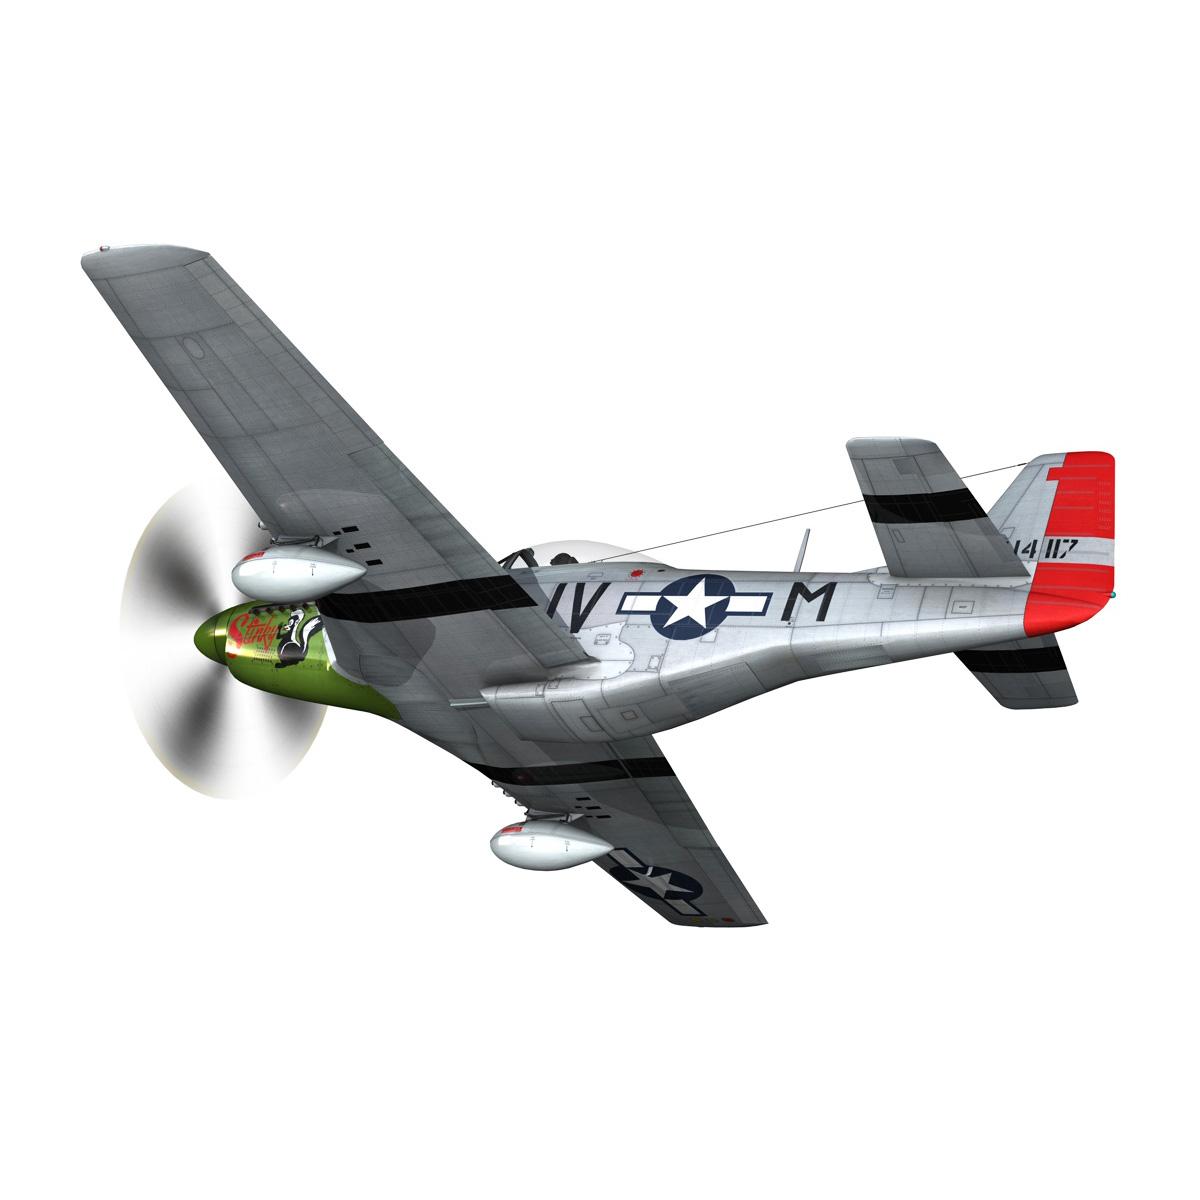 north american p-51d mustang – stinky 3d model fbx c4d lwo obj 269600